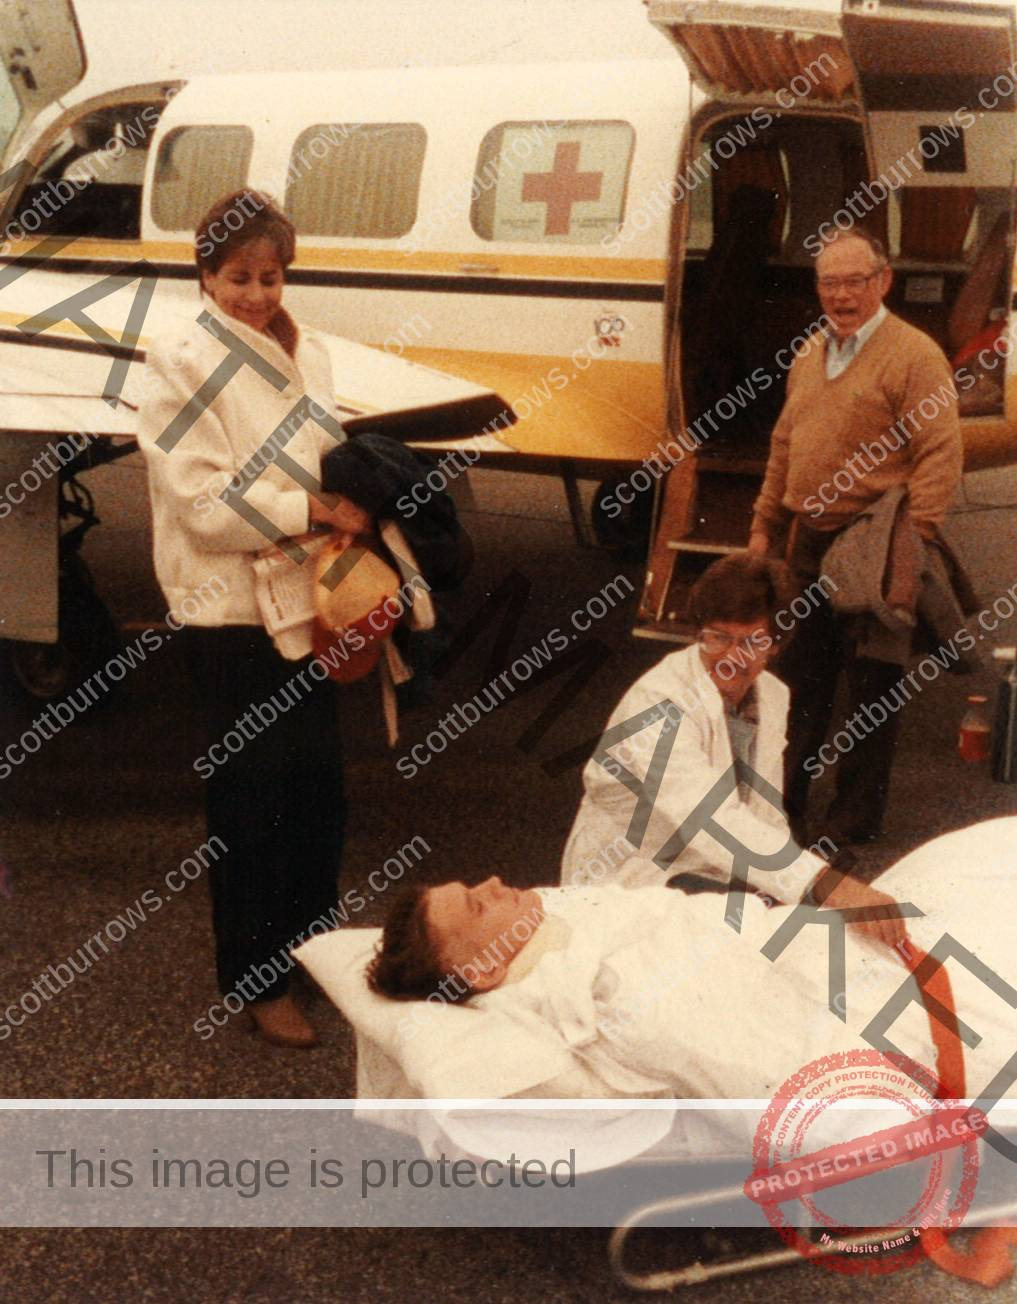 Scott Burrows accident